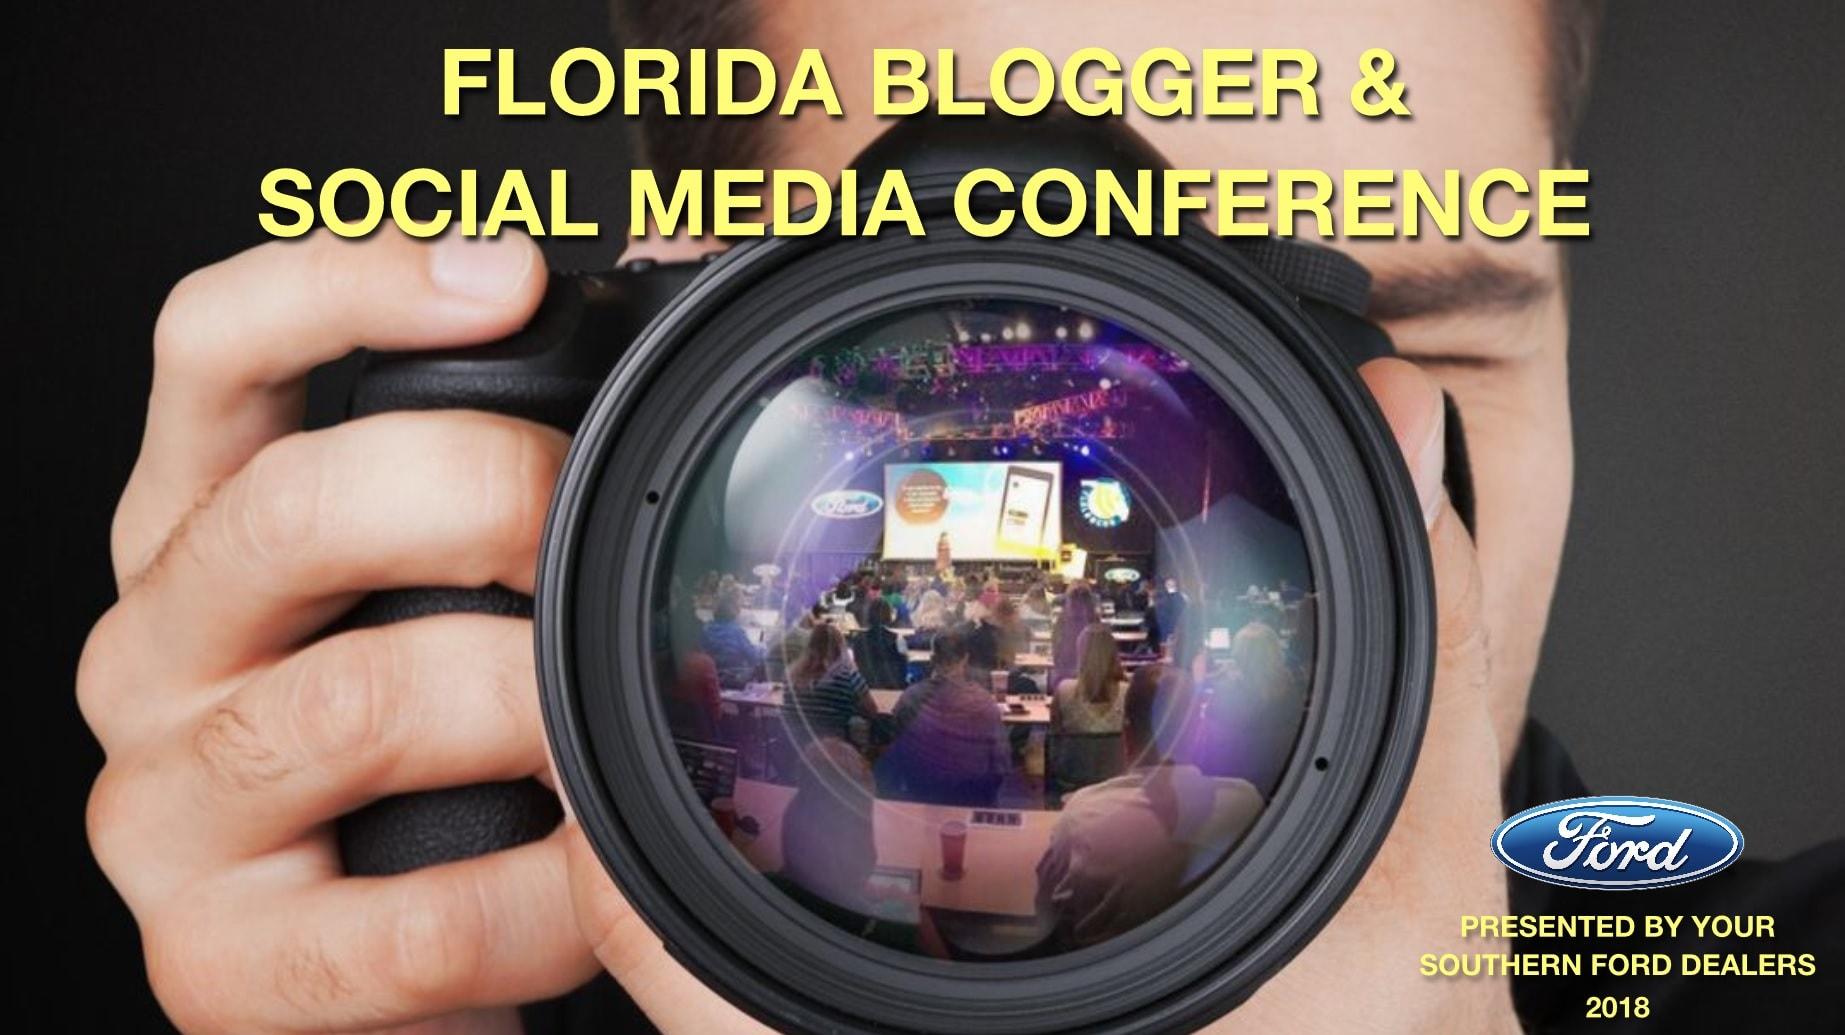 FL Blog Con - Florida Blogger and Social Media Conference